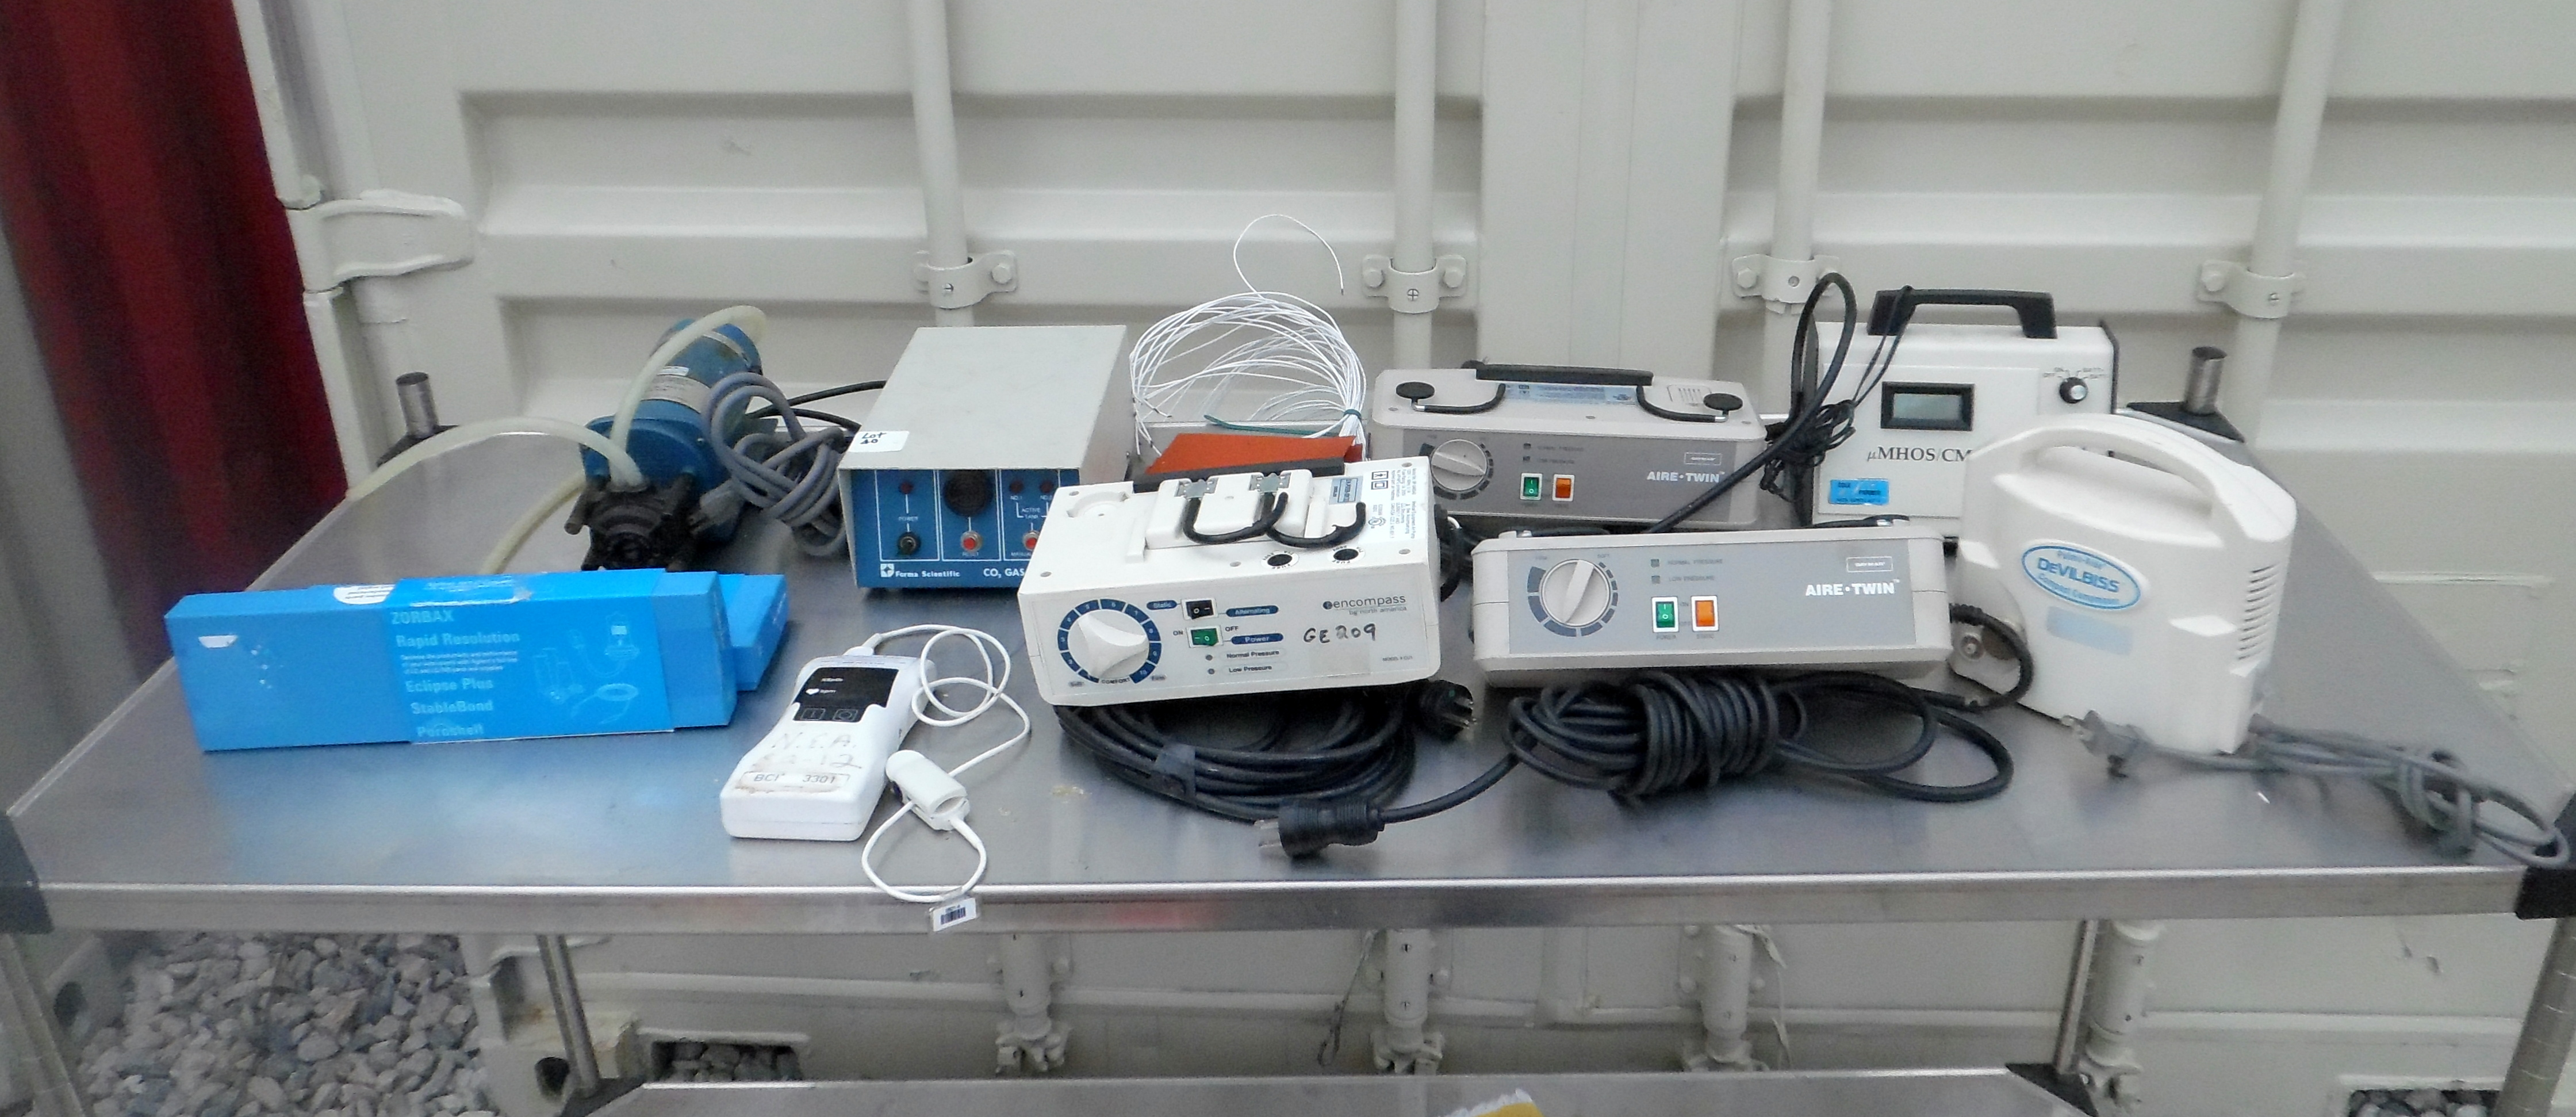 Lot 40 - Lot of medical equipment